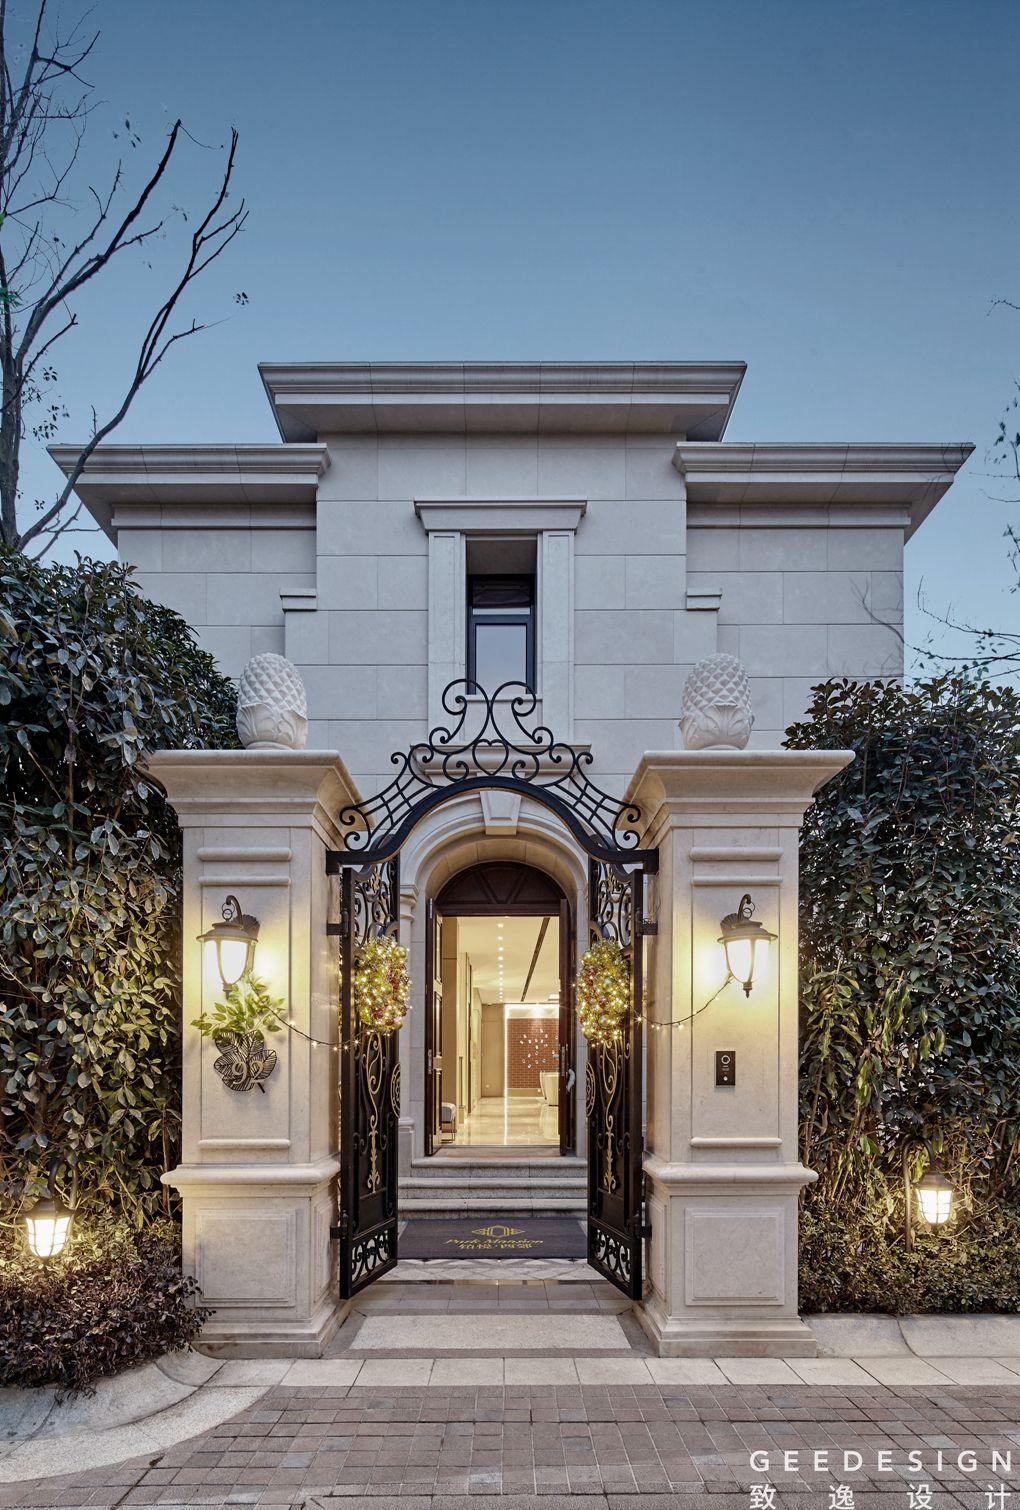 Pin By مقاول واجهات فلل في الكويت 550 On 旭辉上海柏悦西郊高尔夫别墅 Classic House Exterior House Outside Design House Gate Design